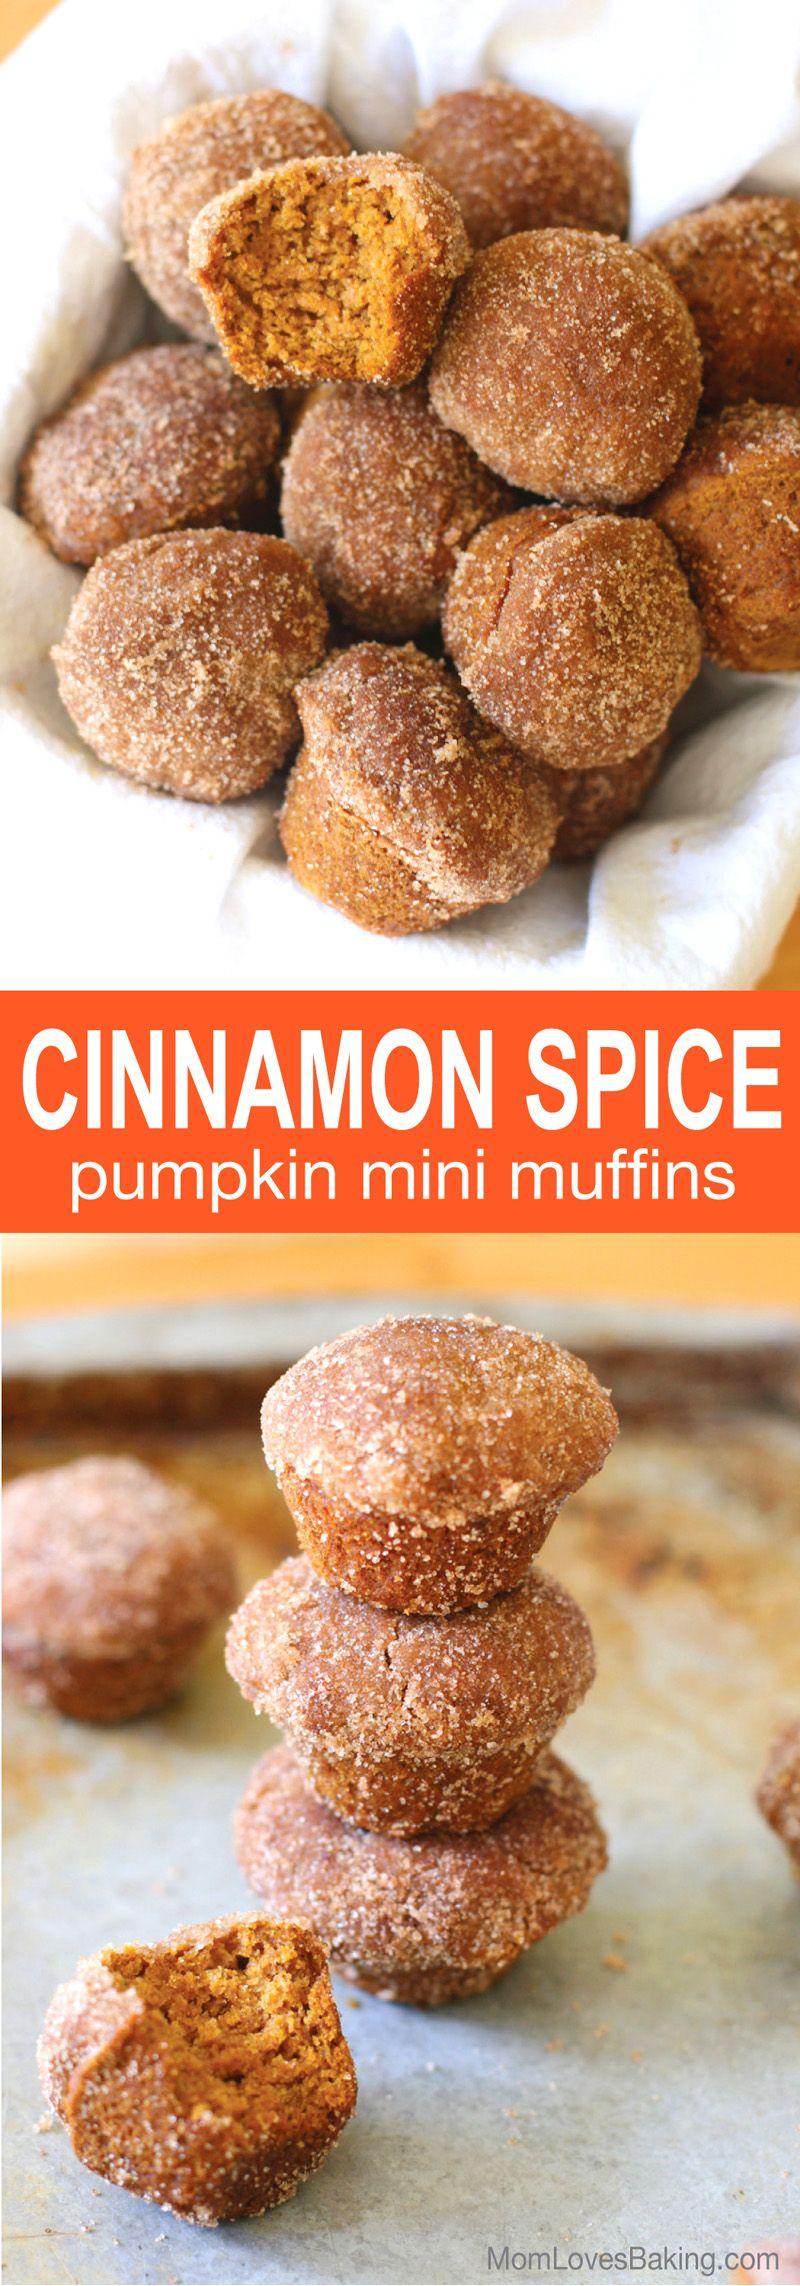 Cinnamon Spice Pumpkin Mini Muffins #pumpkinmuffins